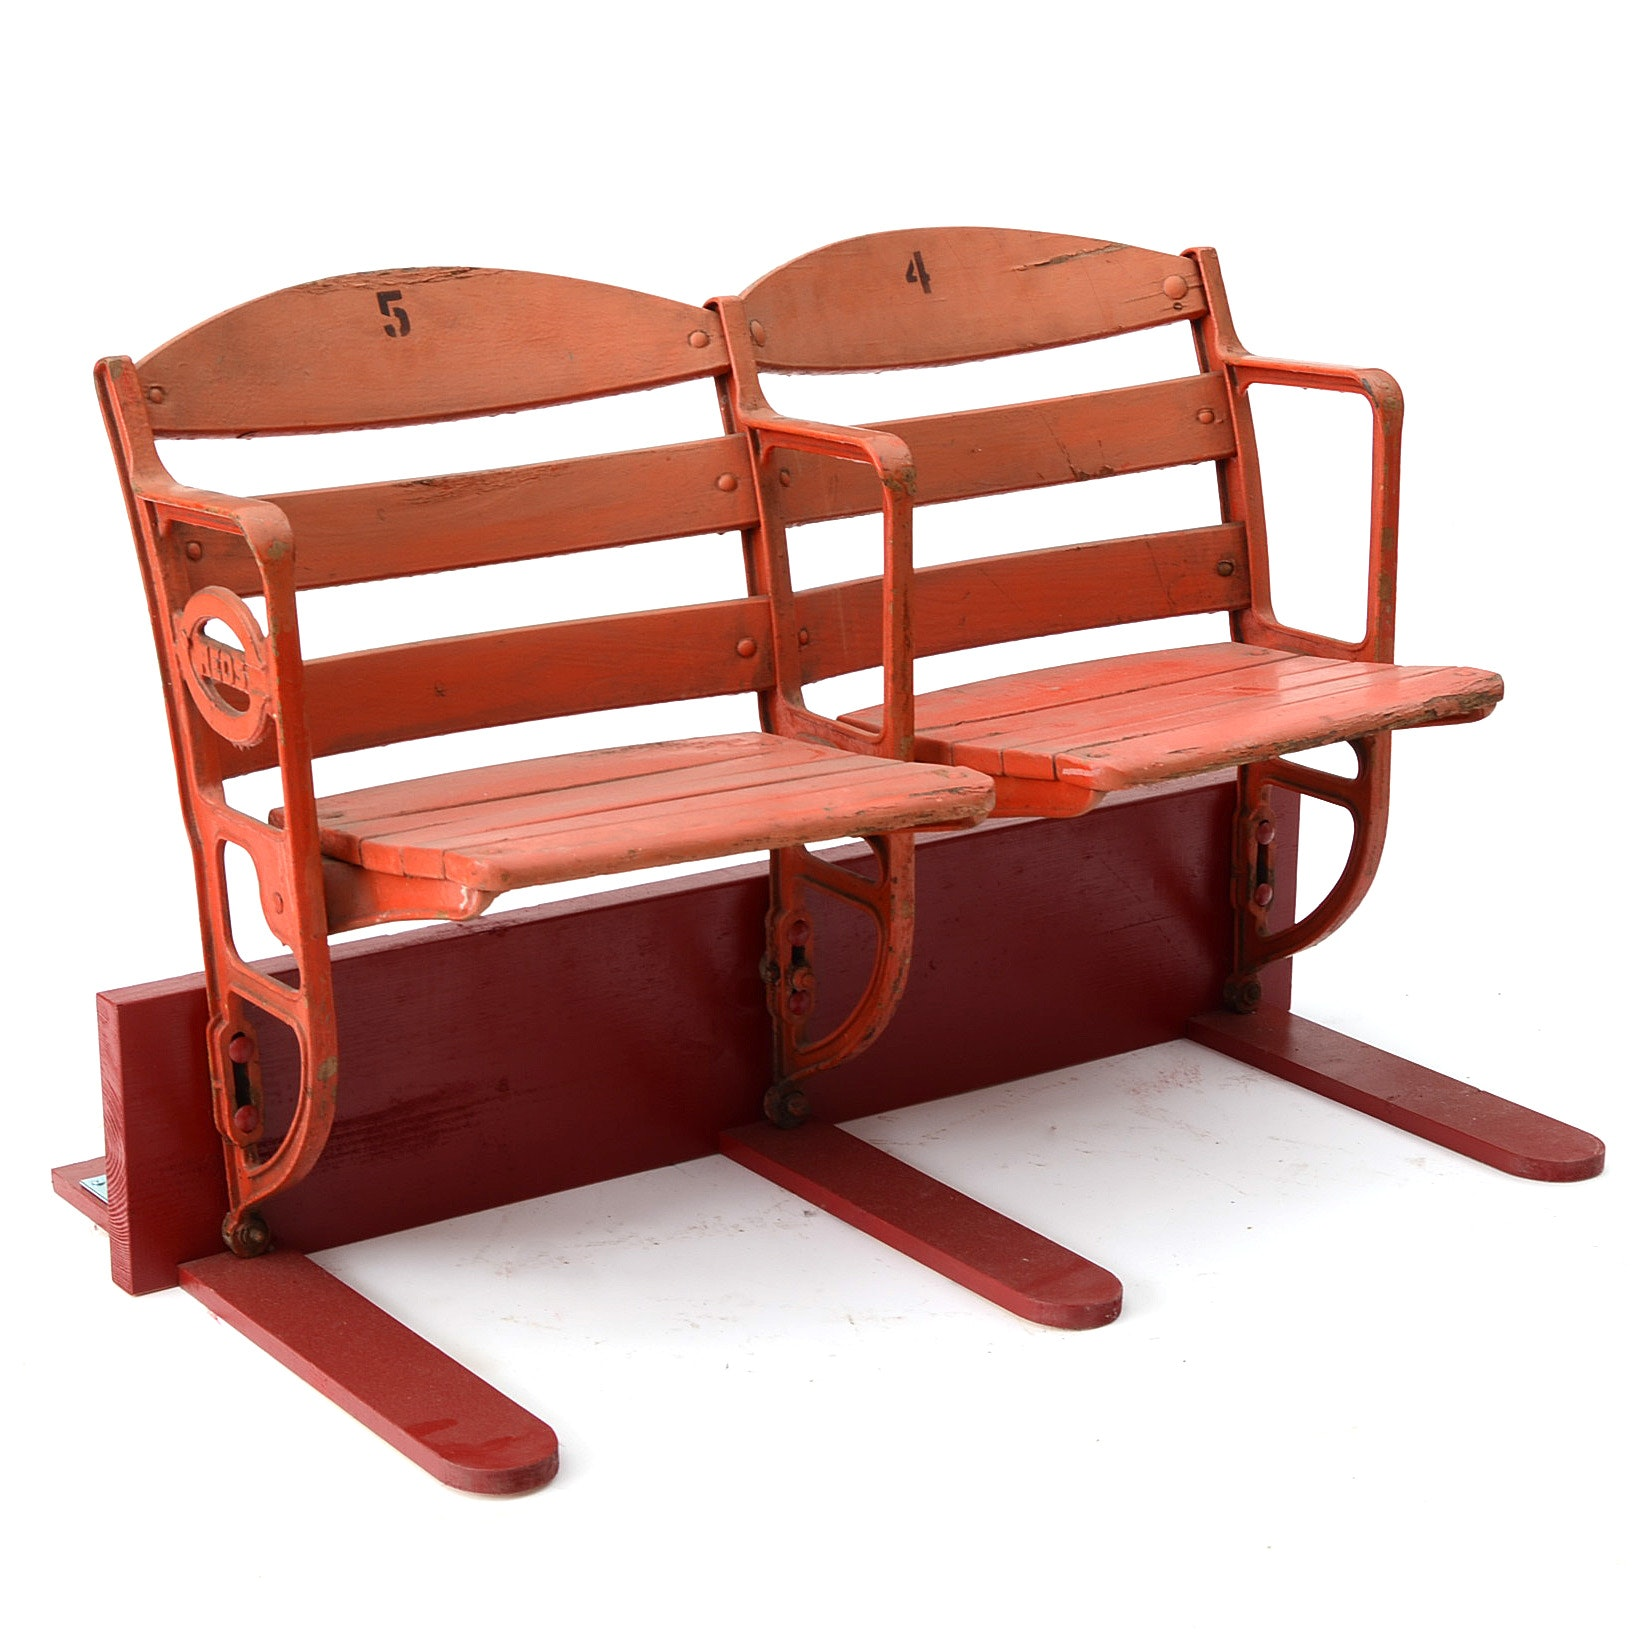 Crosley Field Seats with Emblem